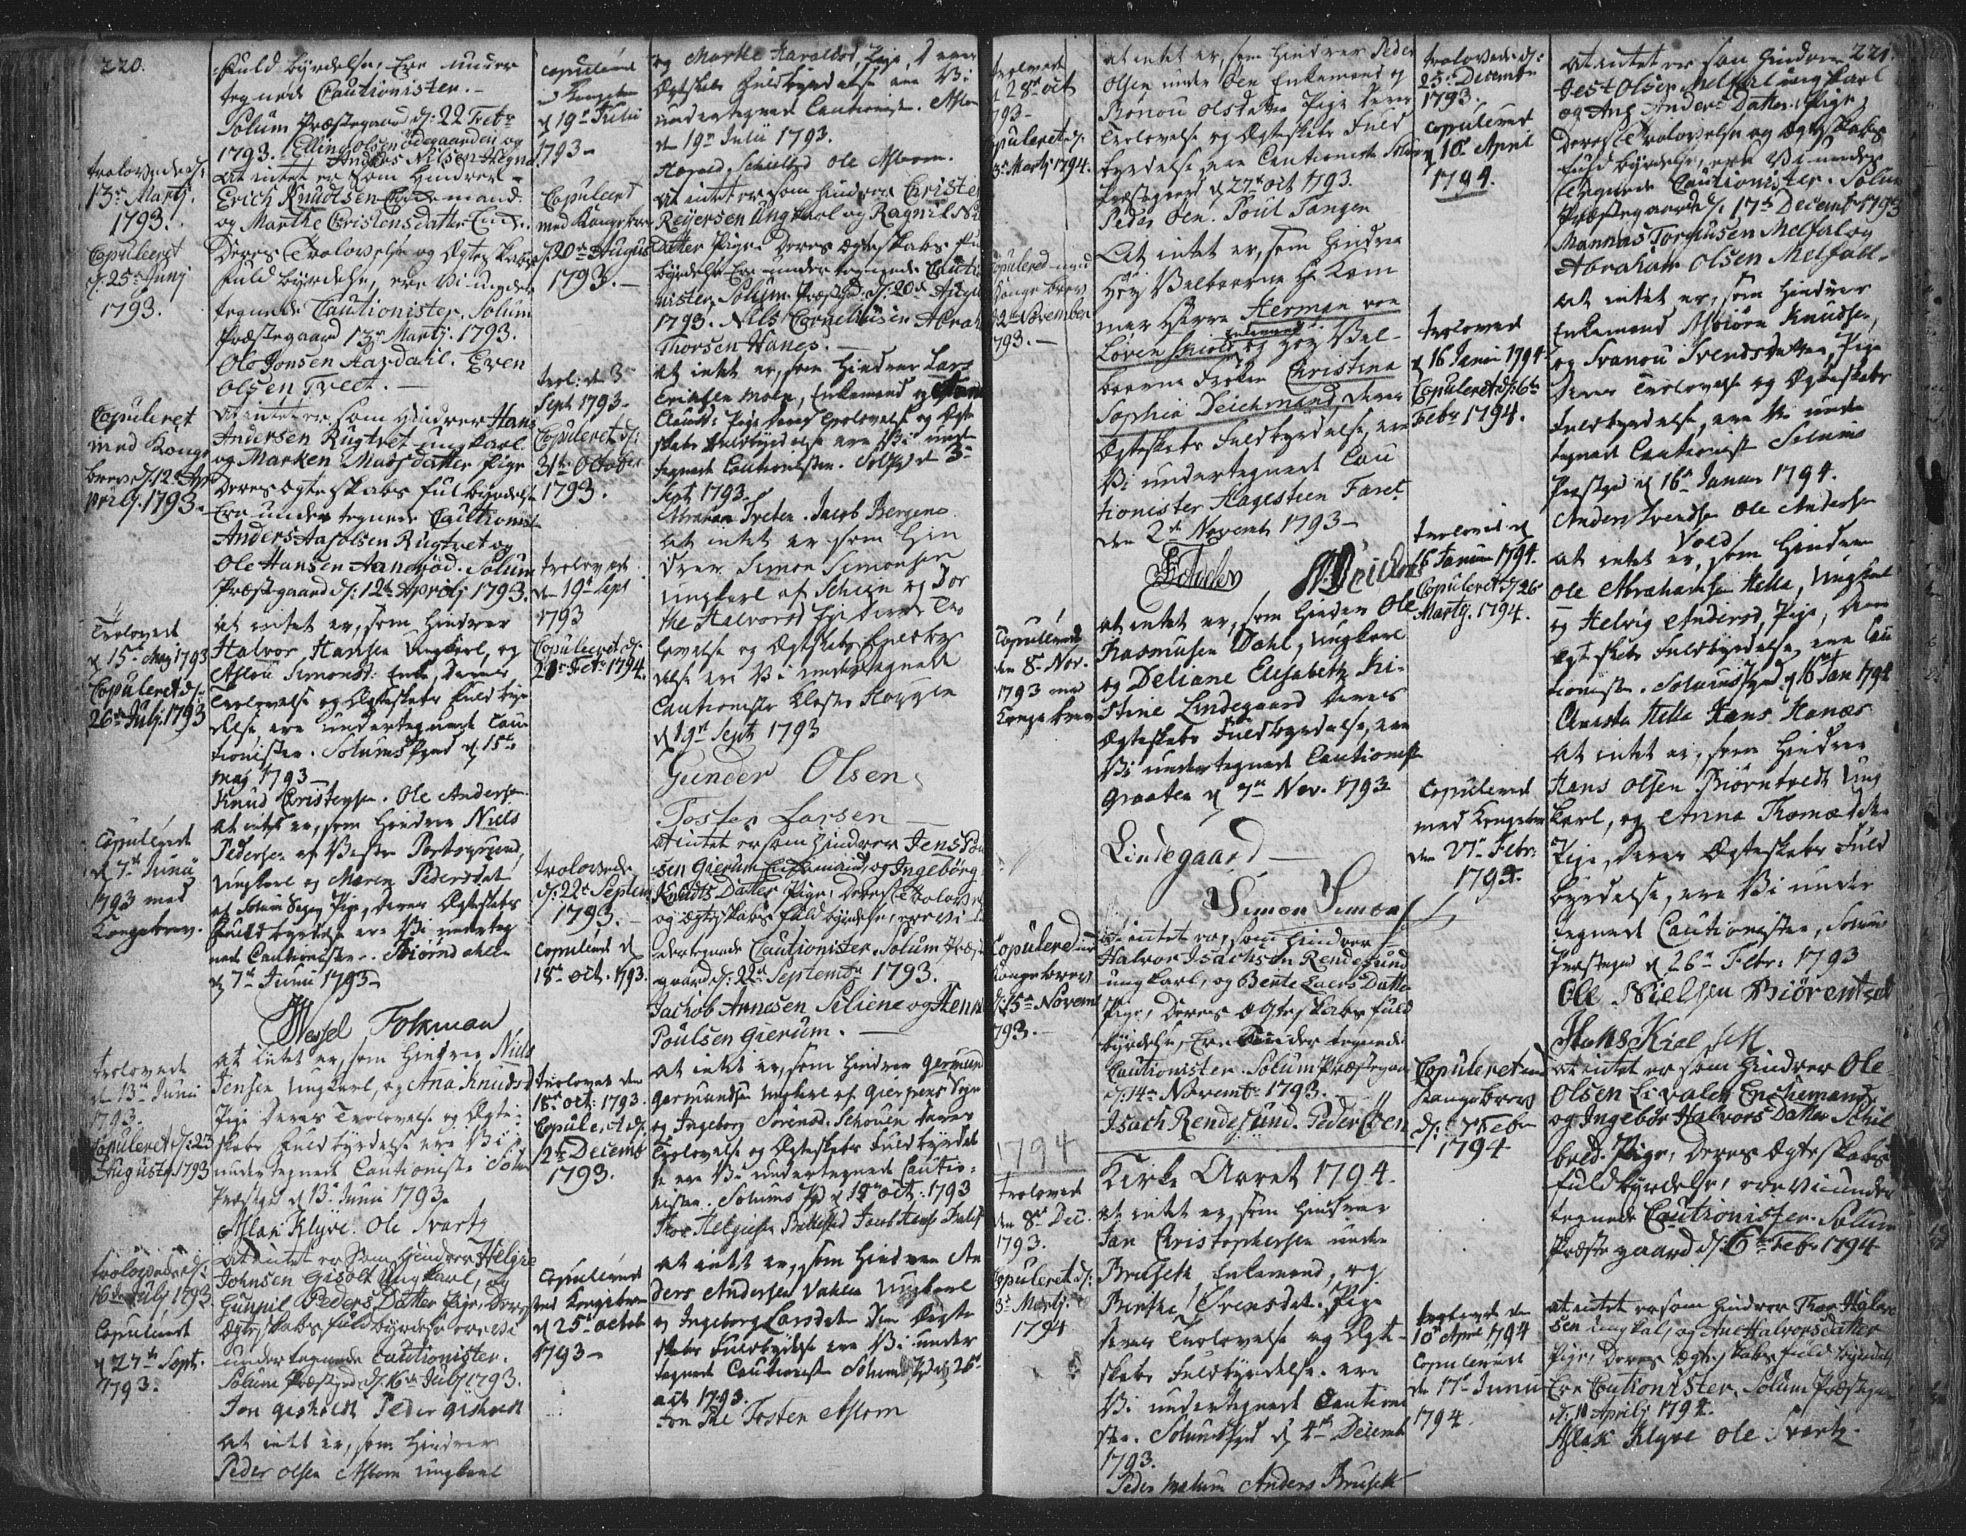 SAKO, Solum kirkebøker, F/Fa/L0003: Ministerialbok nr. I 3, 1761-1814, s. 220-221